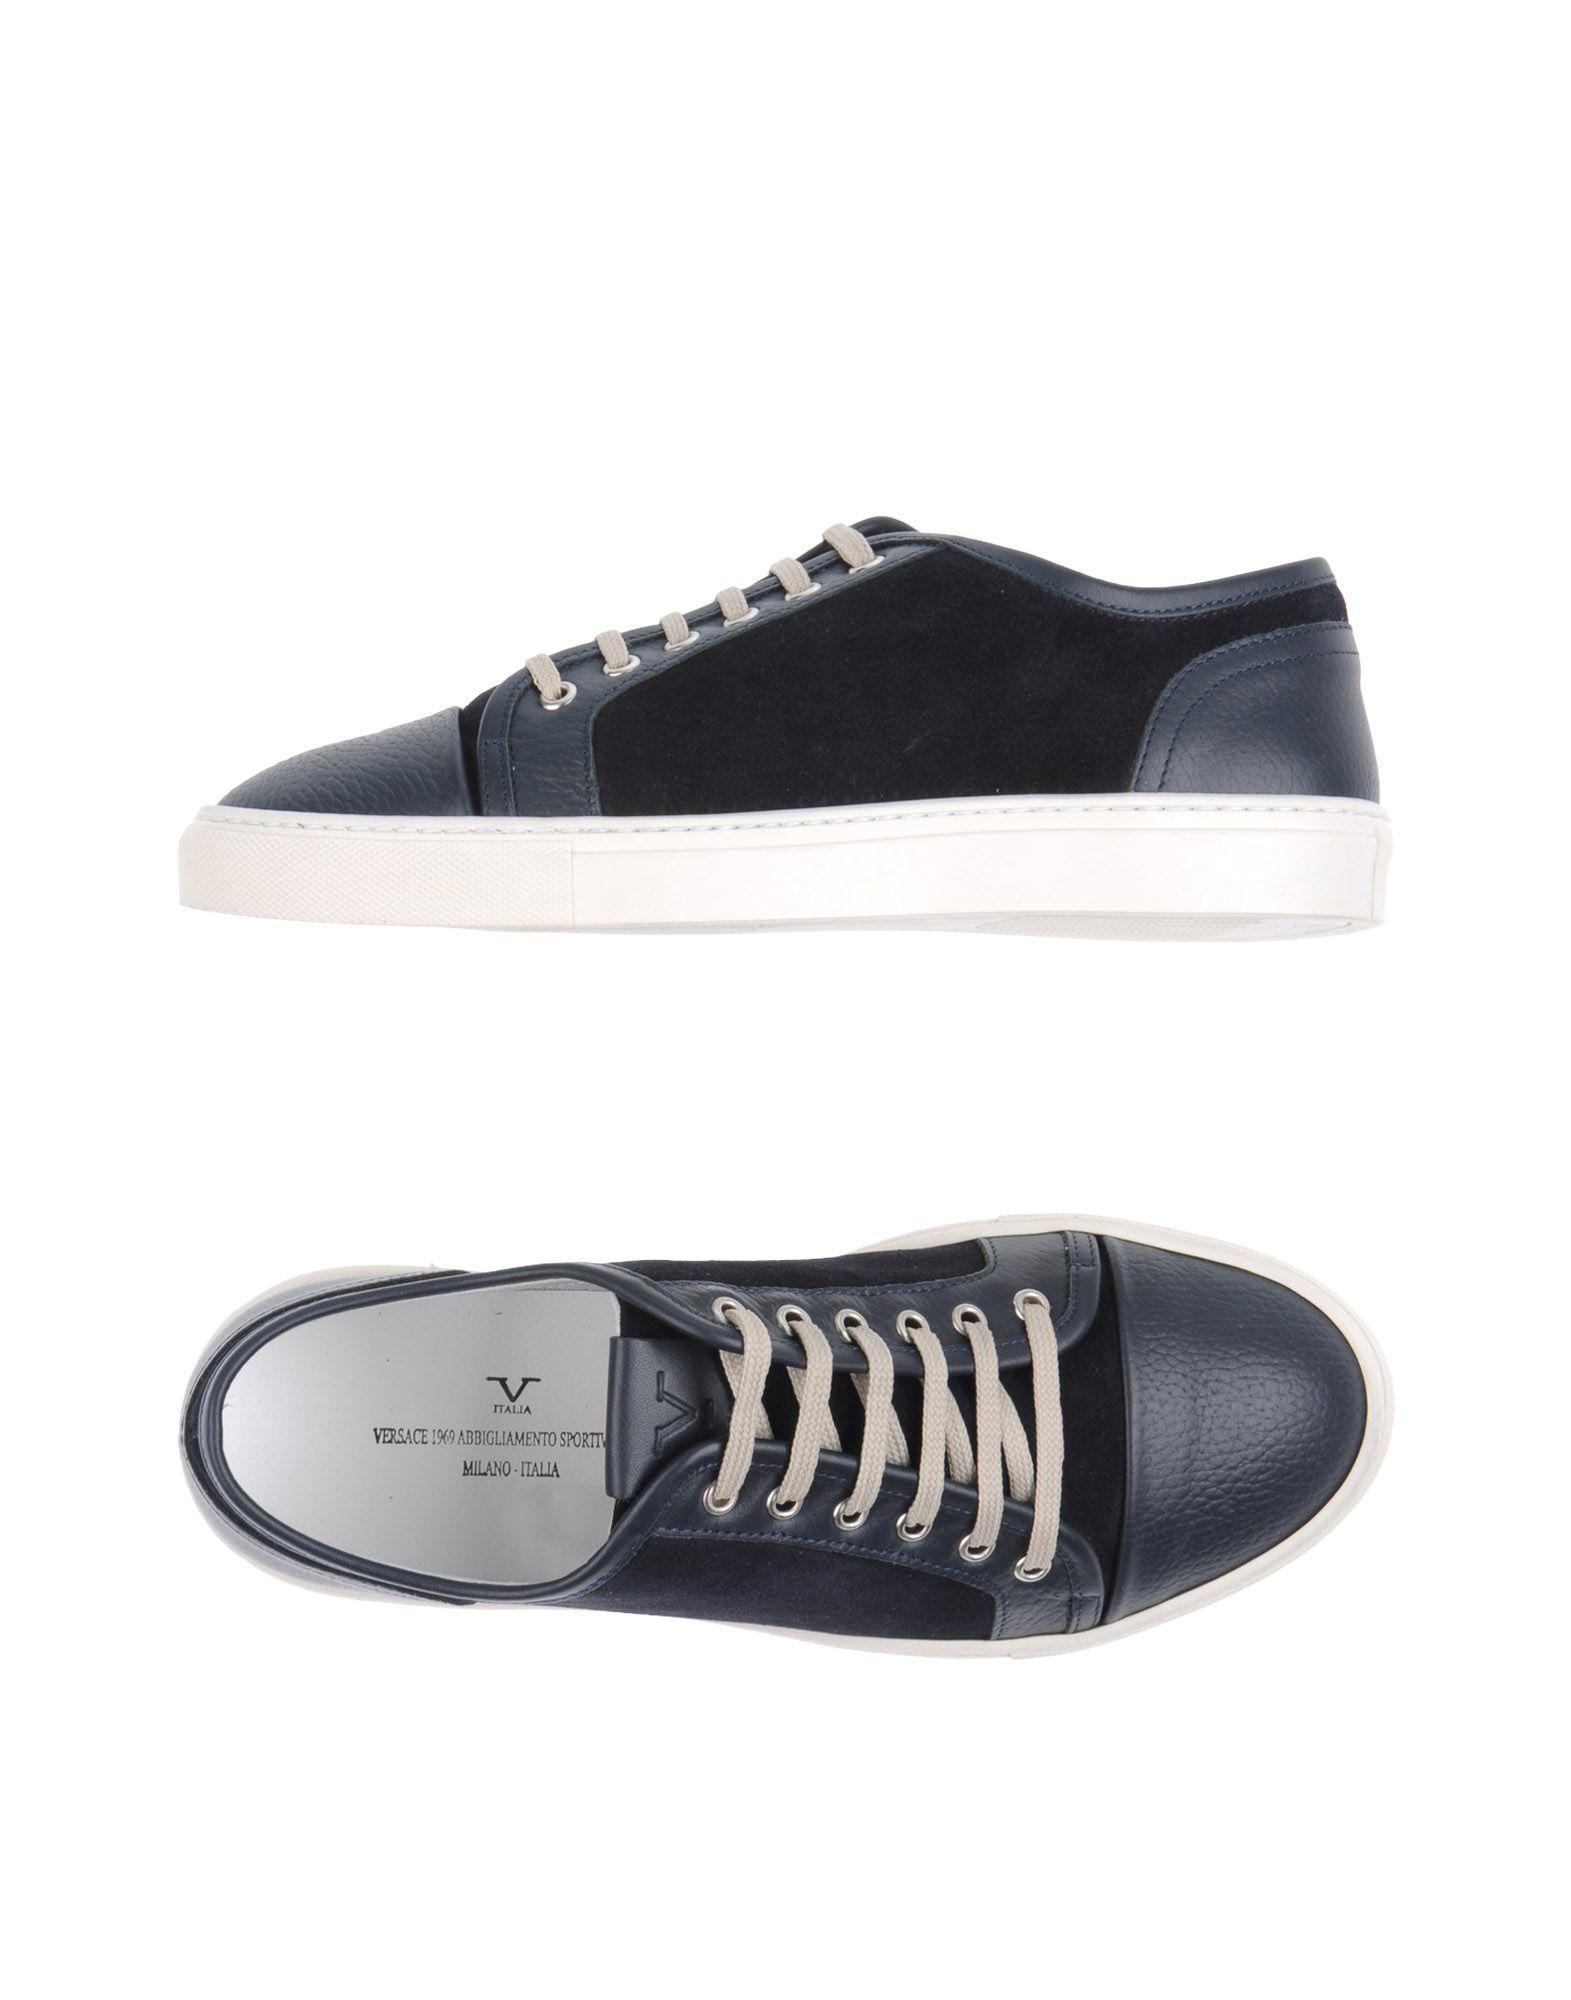 Rabatt echte Sneakers Schuhe V Italia Sneakers echte Herren  11172745LK 9949e4